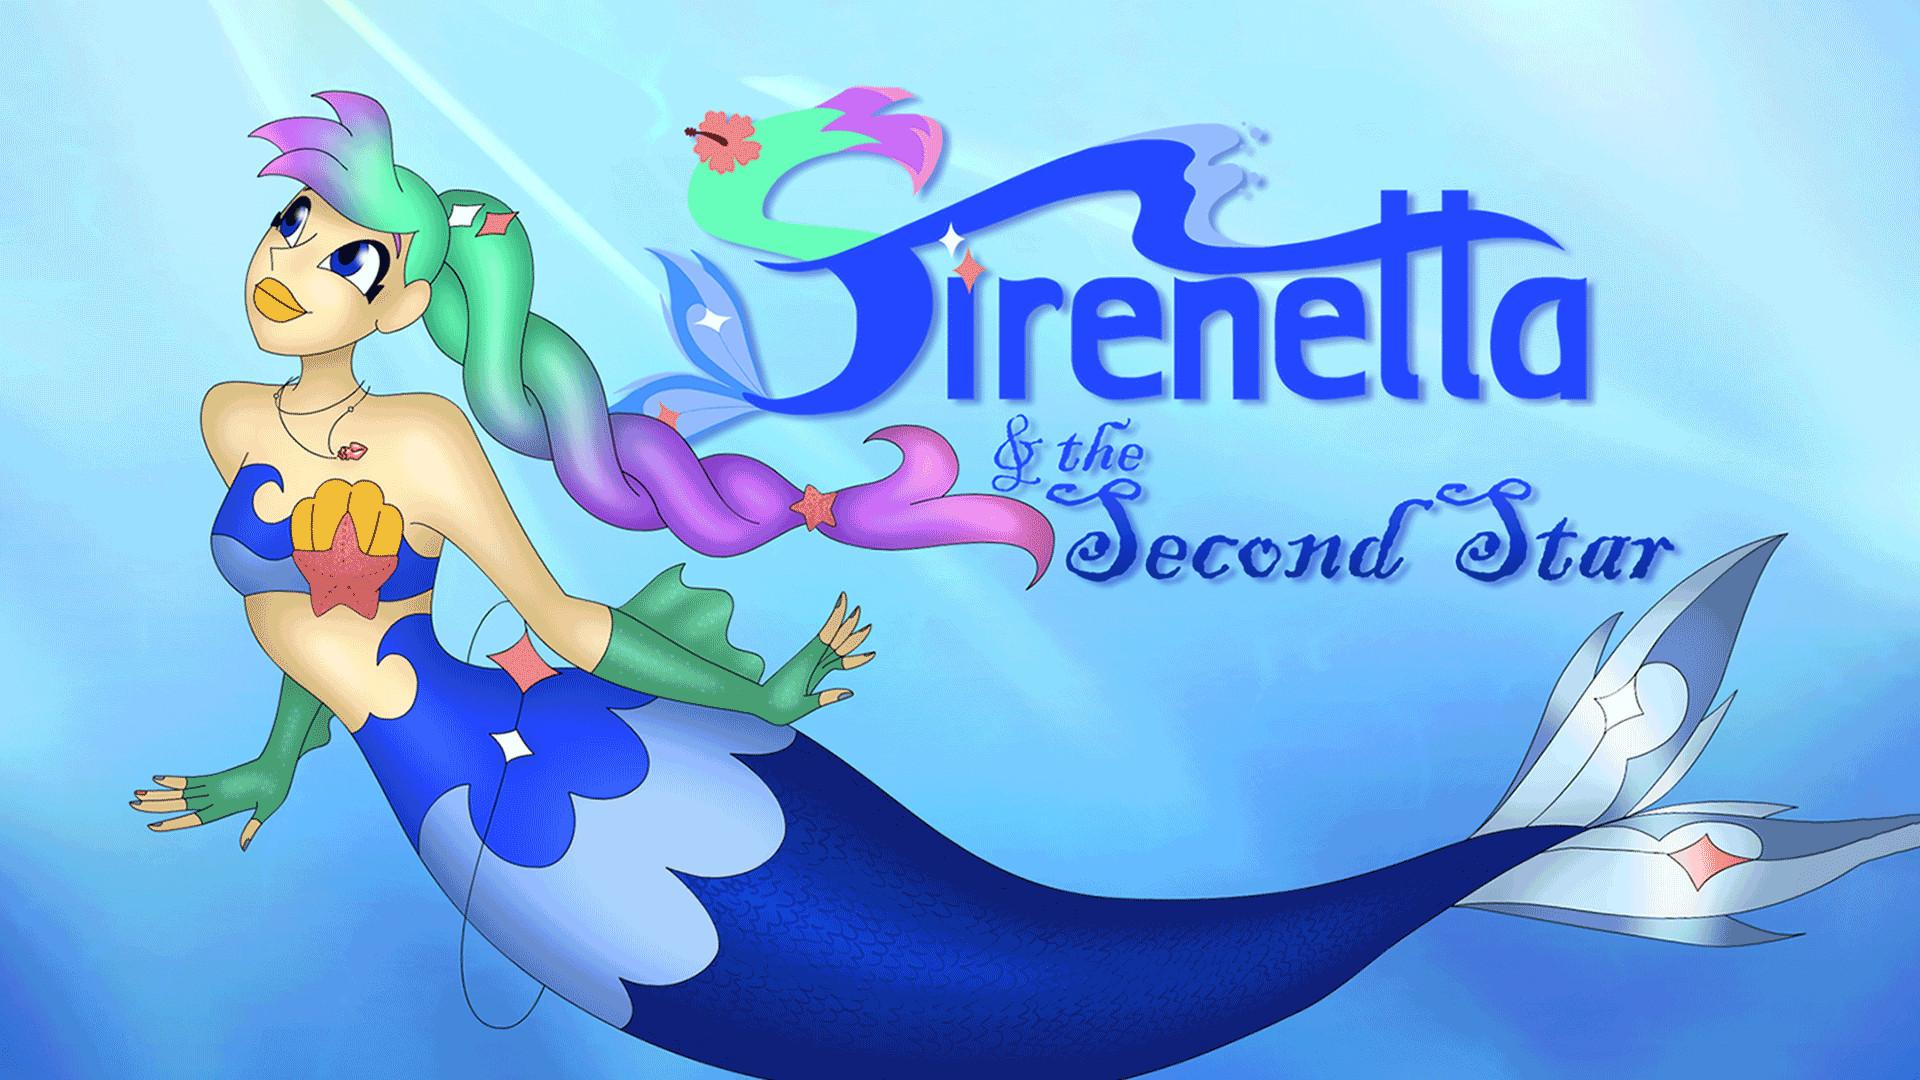 Sirenetta & the Second Star